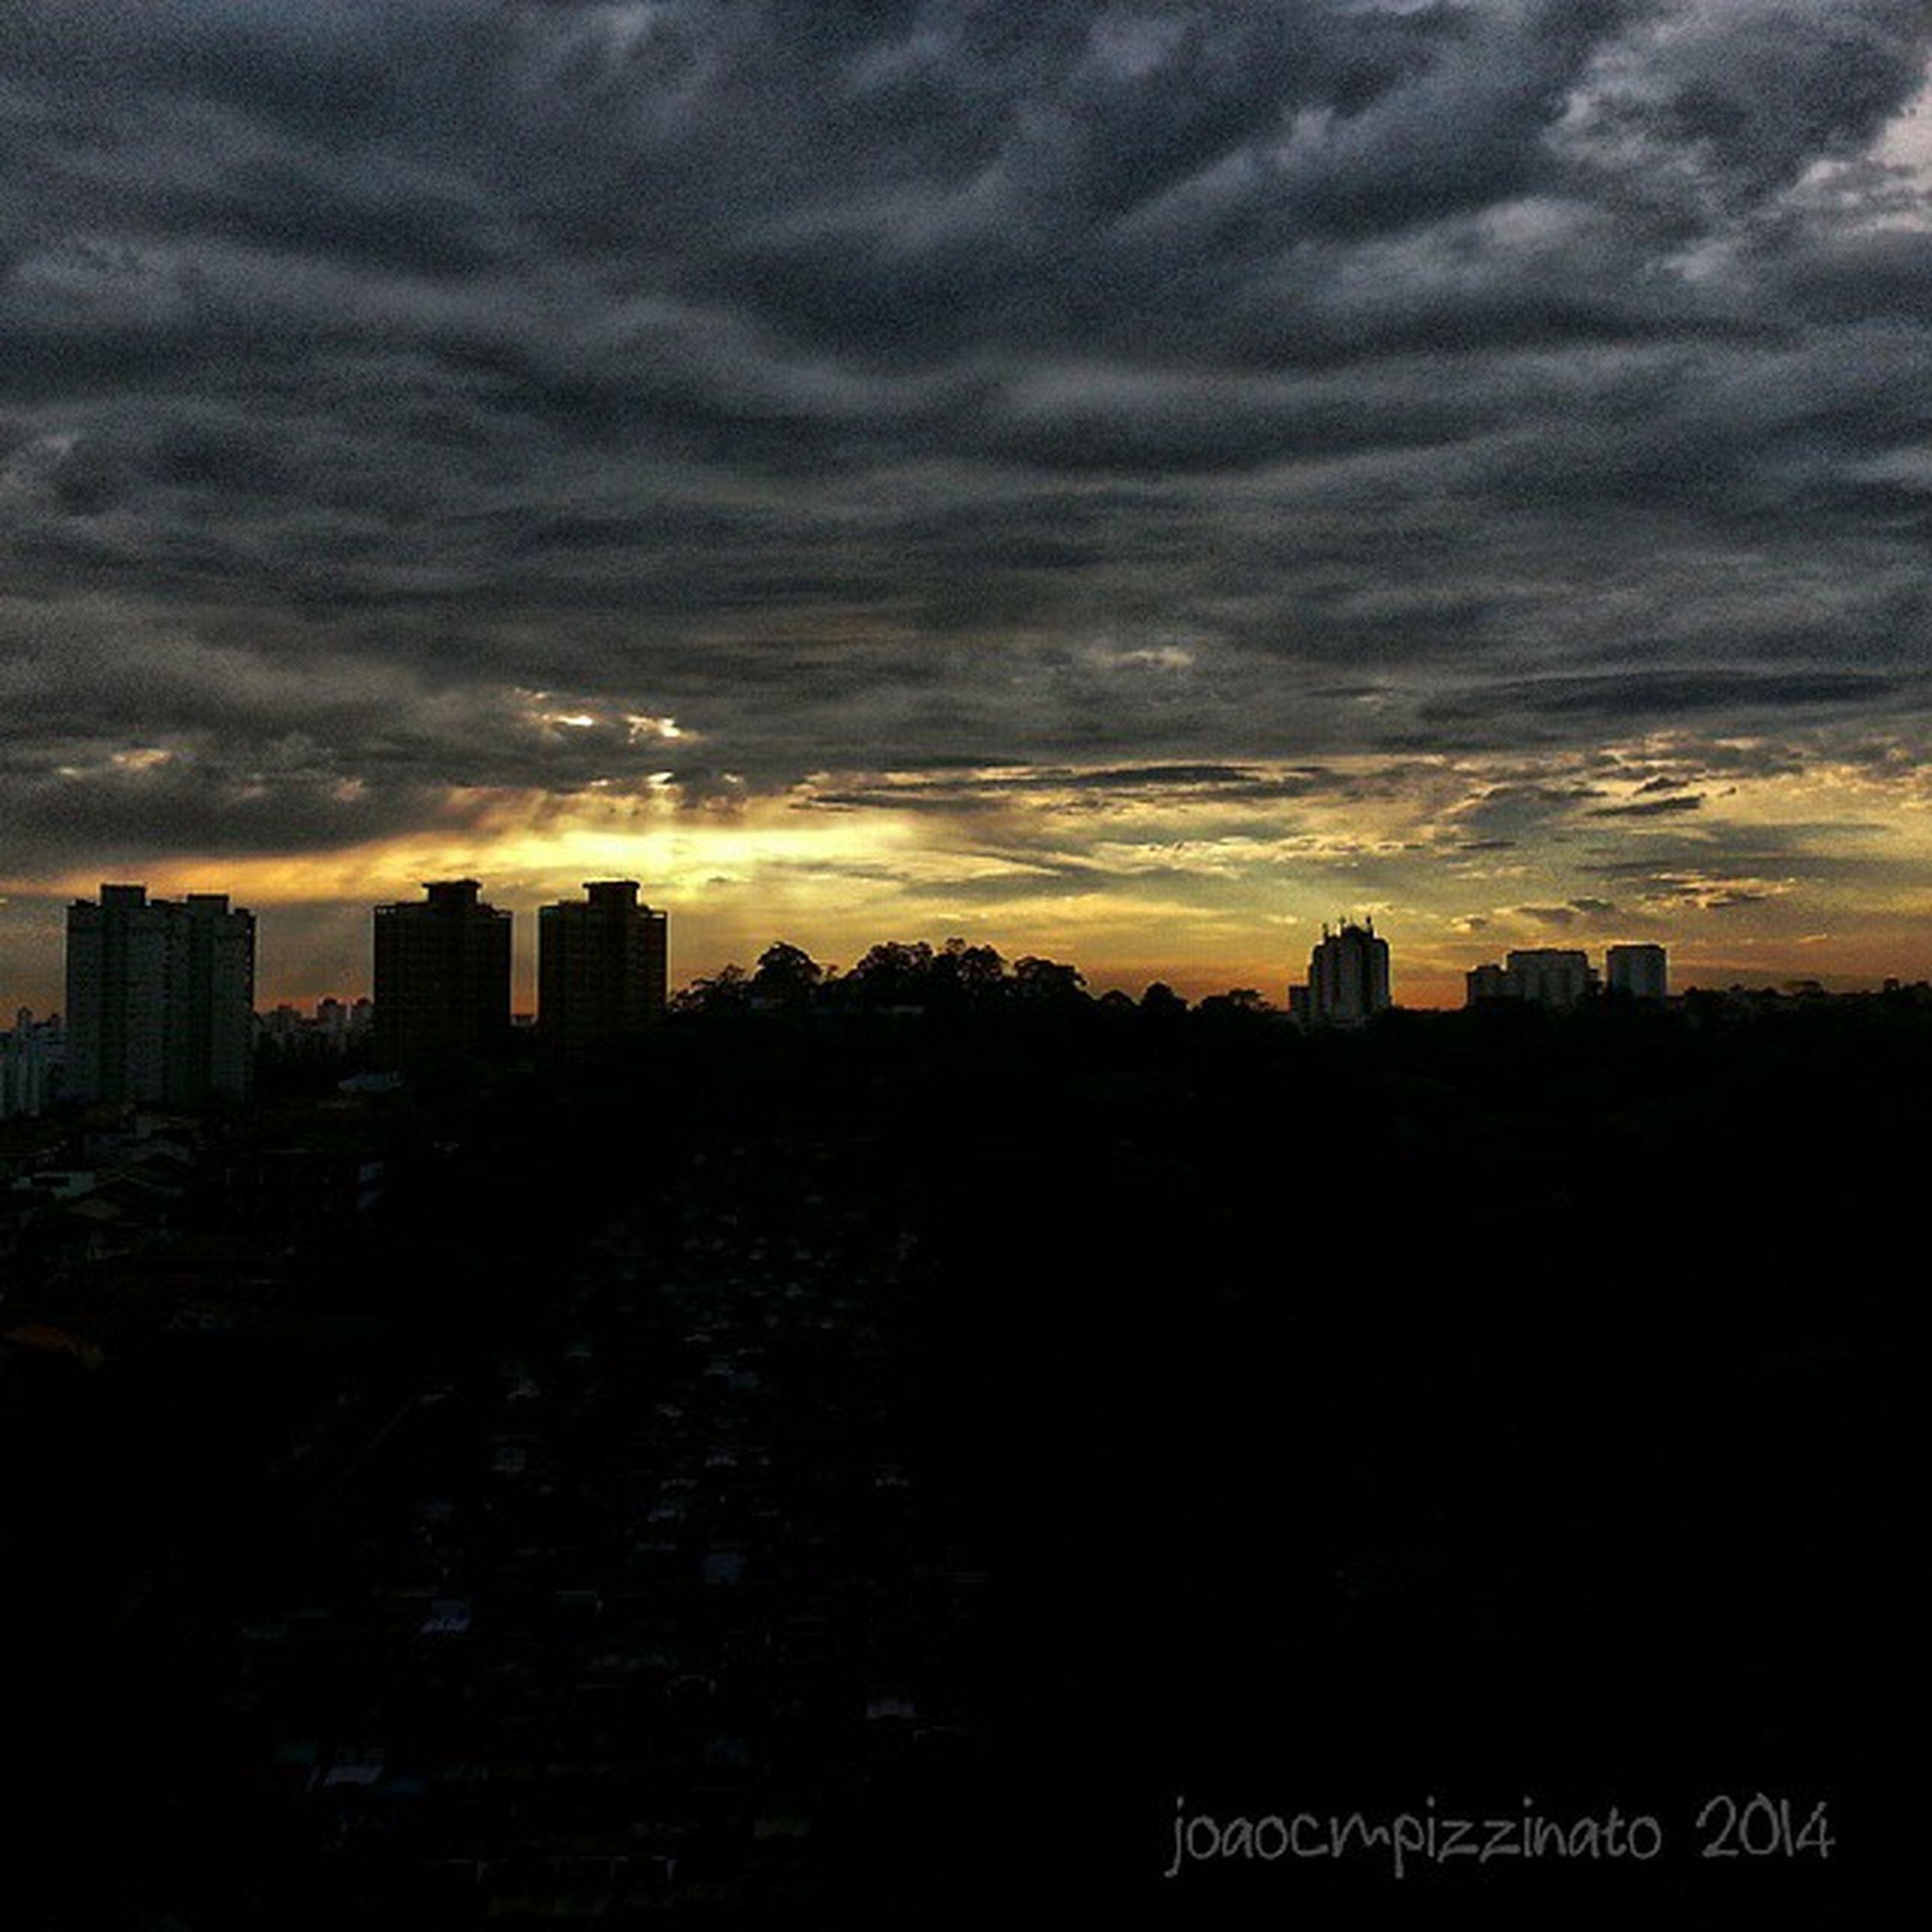 sunset, silhouette, building exterior, sky, architecture, built structure, city, cloud - sky, cityscape, cloudy, dramatic sky, dusk, dark, cloud, scenics, urban skyline, skyscraper, orange color, residential building, weather